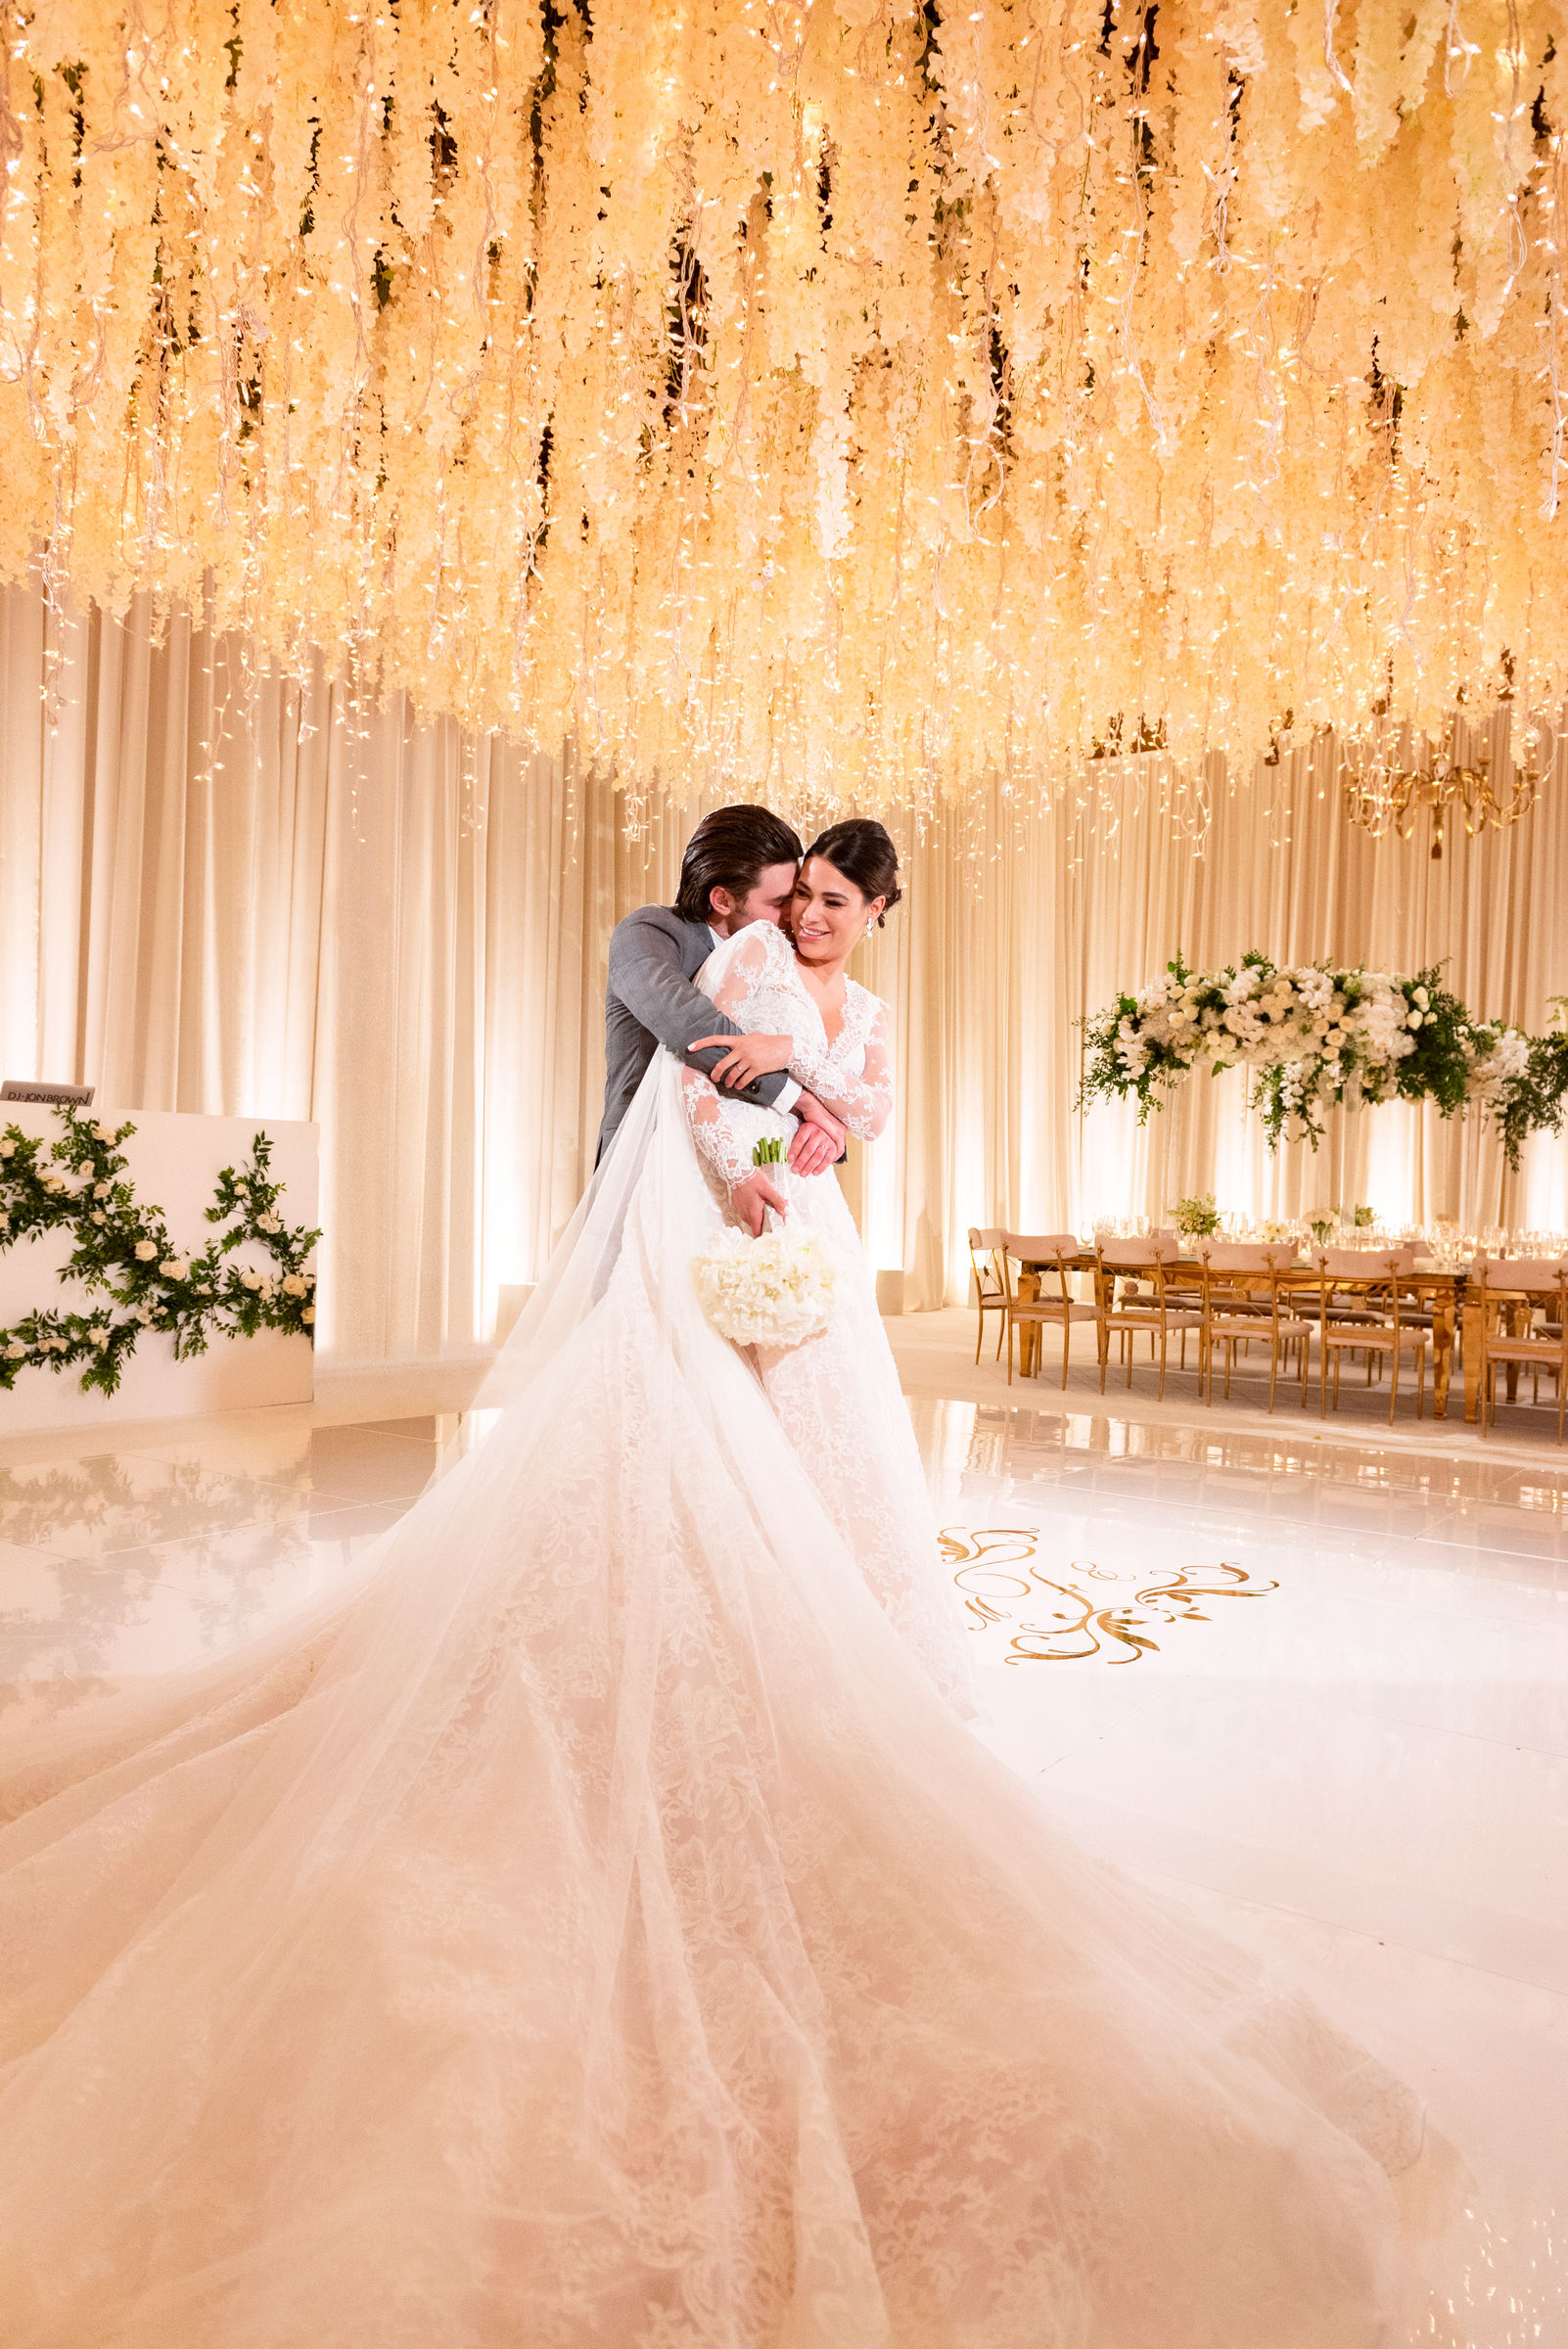 maria-eduardo-montage-beverly-hills-wedding-183.jpg